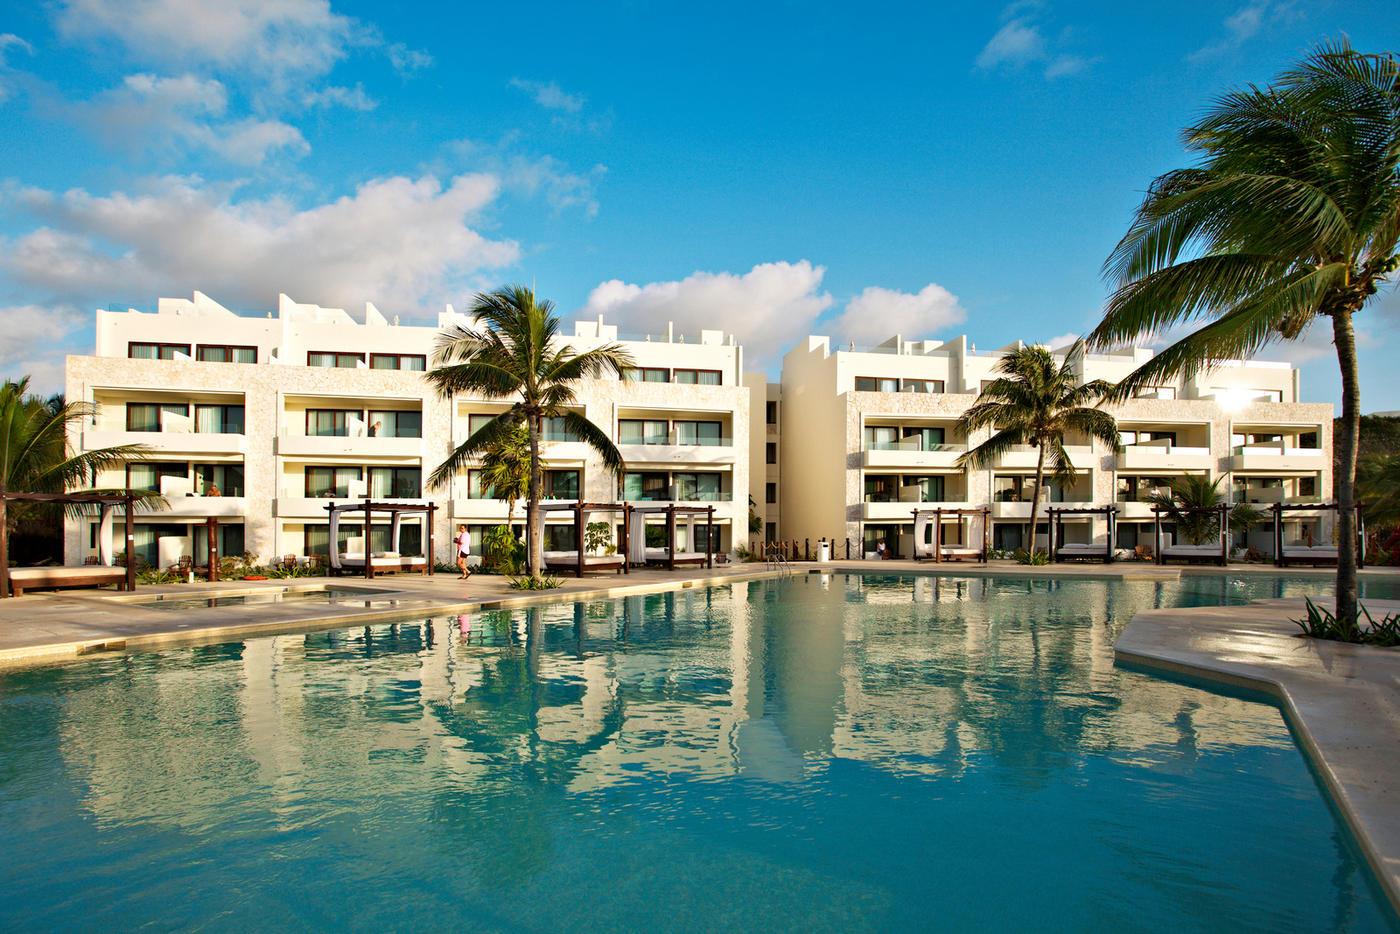 Das schöne Akumal Bay Resort in Mexiko.